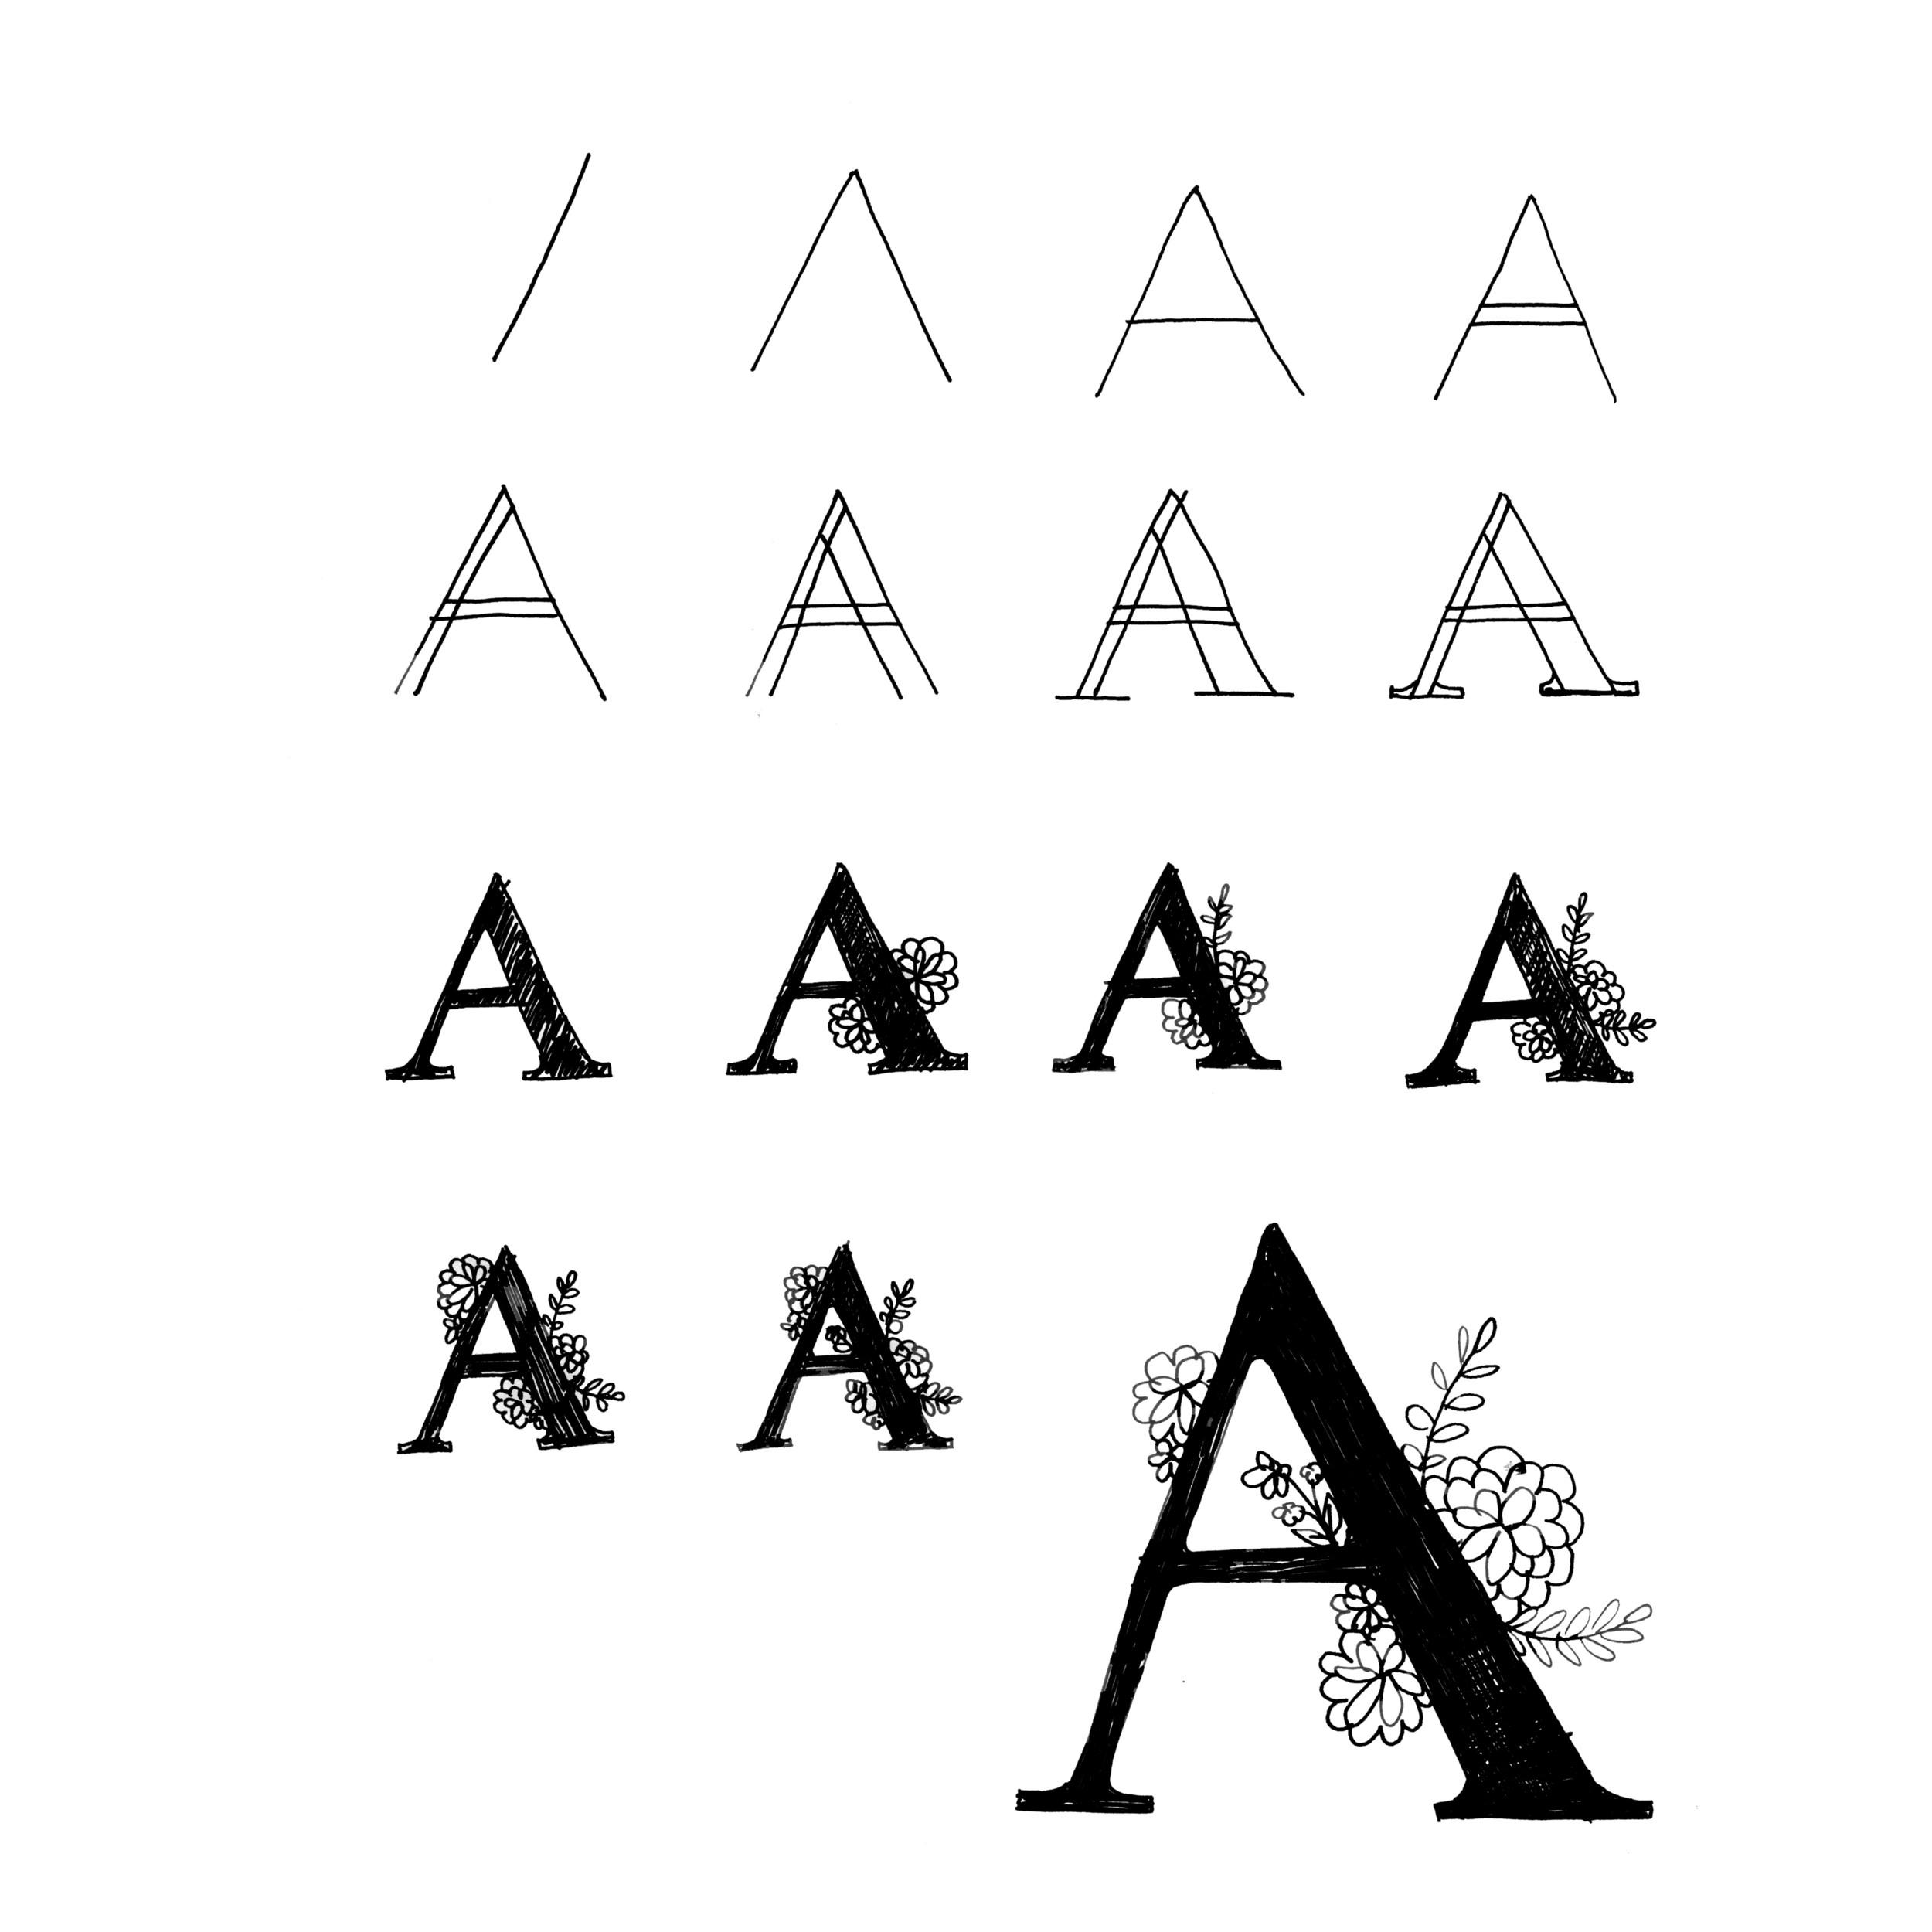 serif_8.jpg